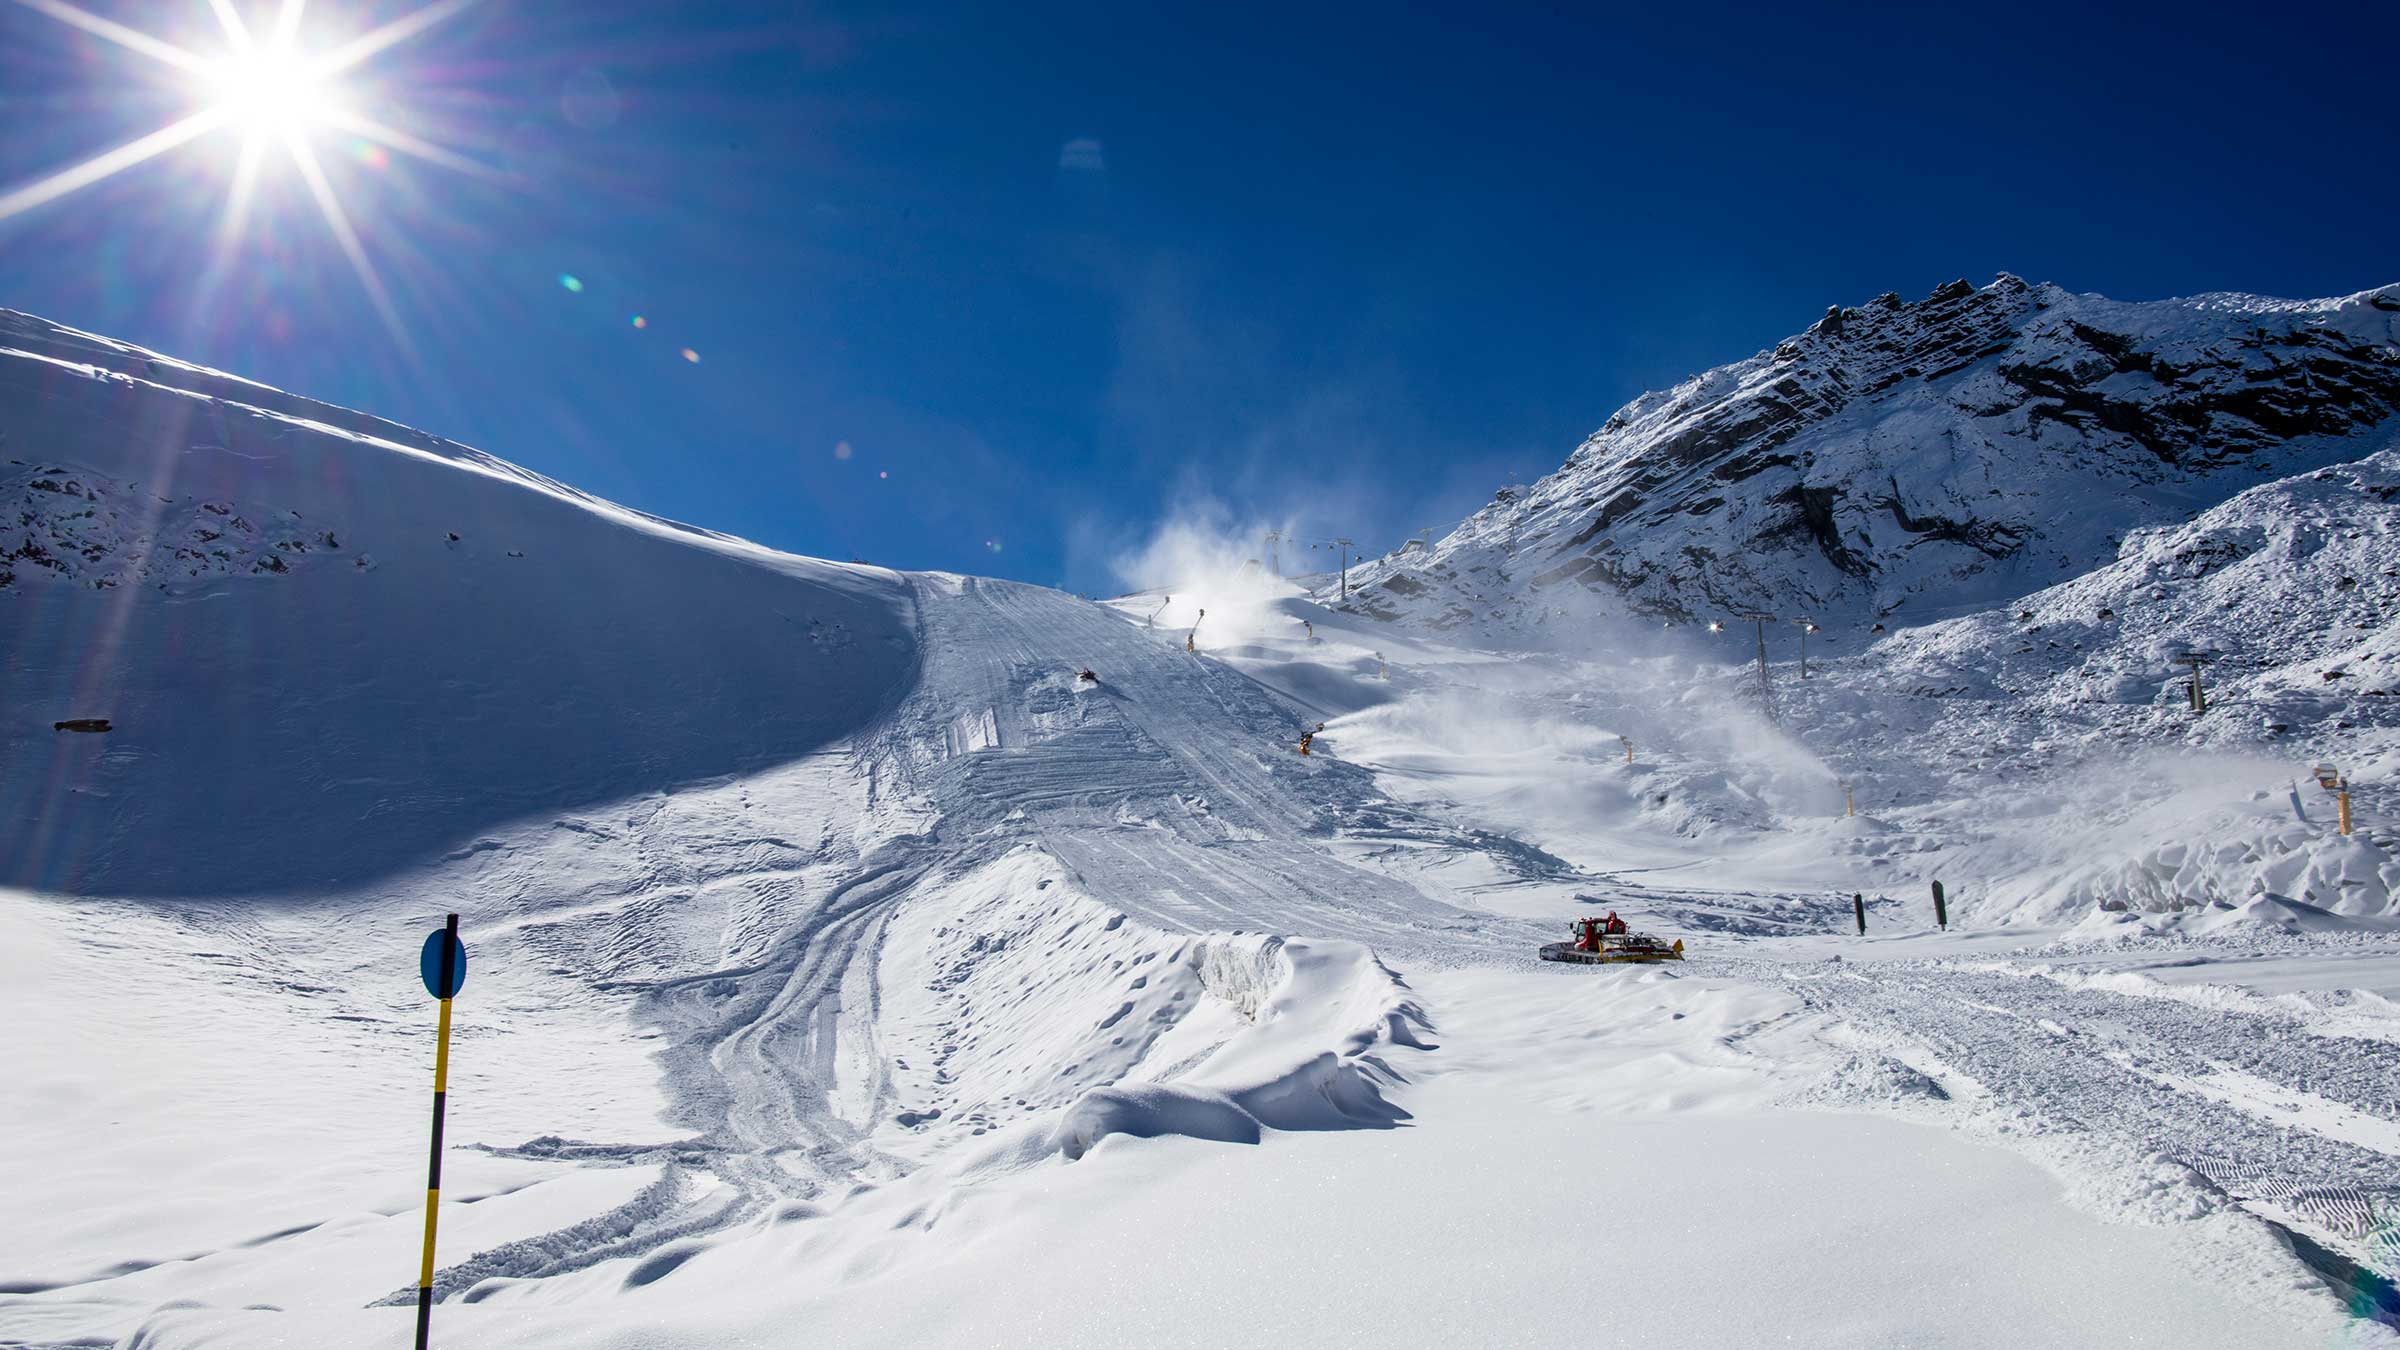 Weltcup Hang einen Tag vor der Abnahme - Sölden, Ötztal, Tirol